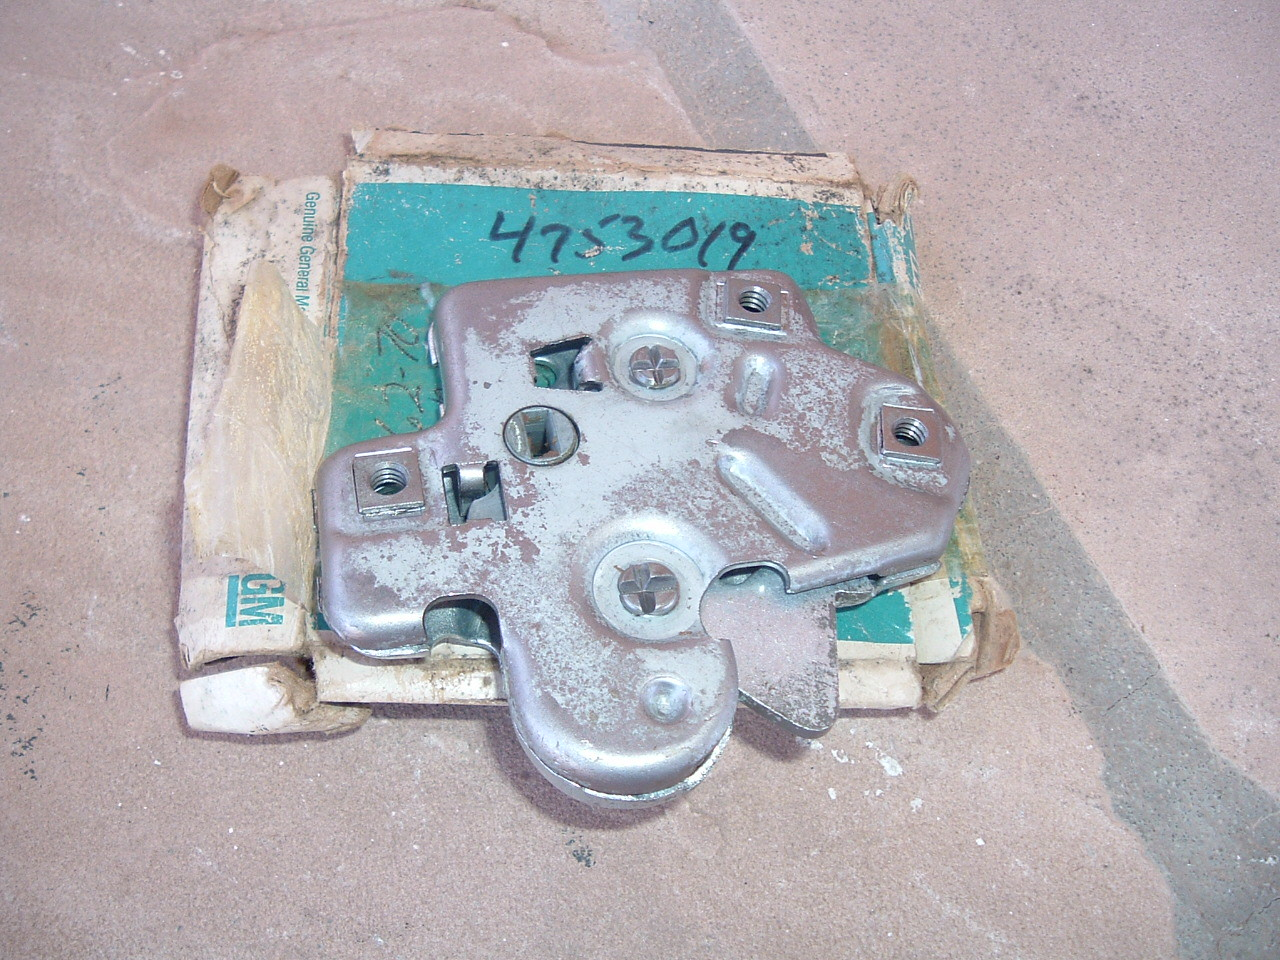 1959 61 63 65 67 69 70 corvette camaro trunk lock nos gm # 4753019 (z 4753019)